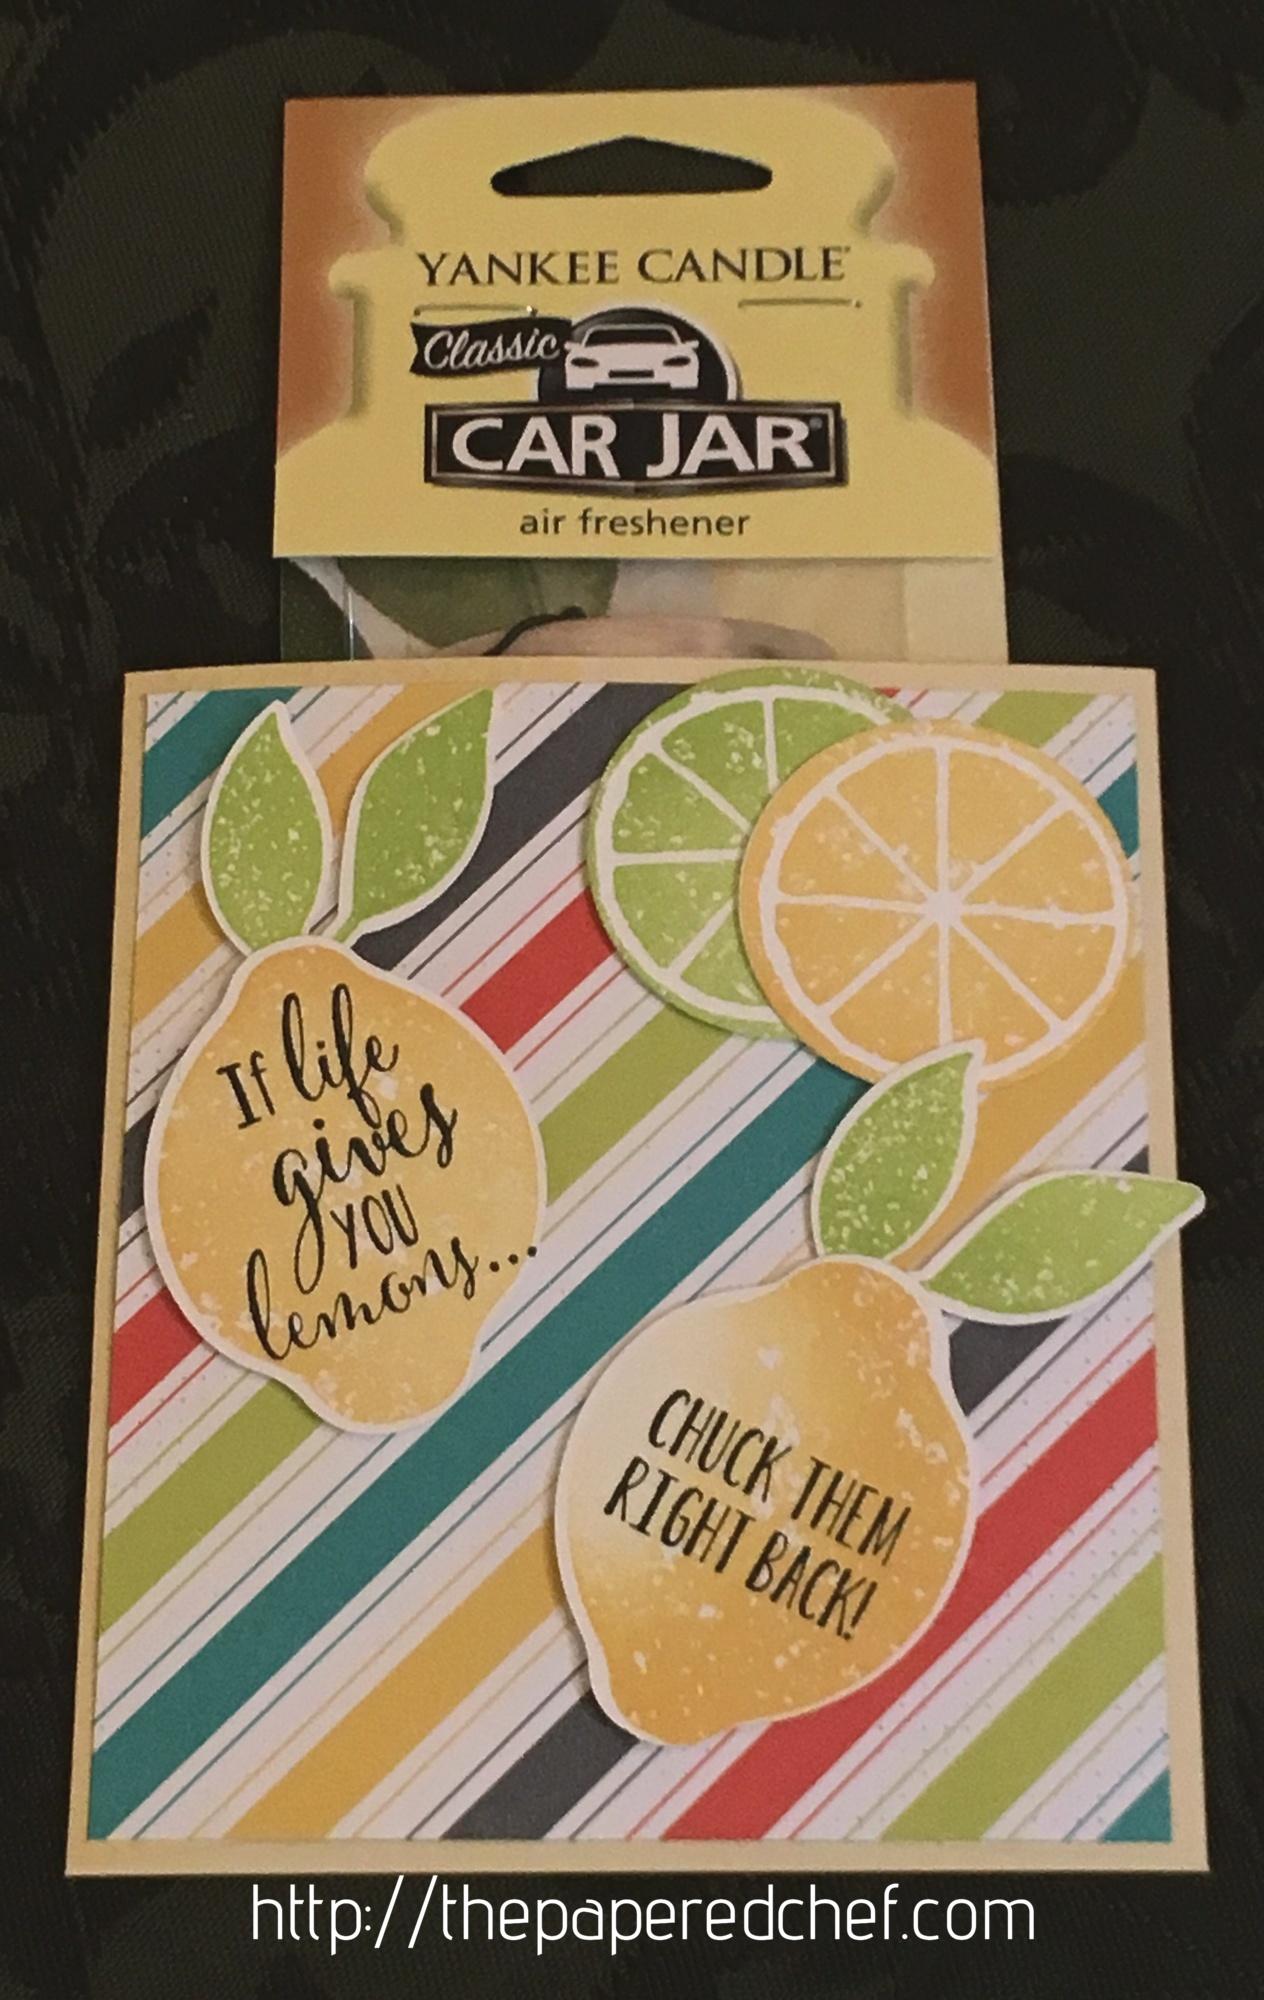 Lemon Zest Yankee Candle Air Freshener Holder